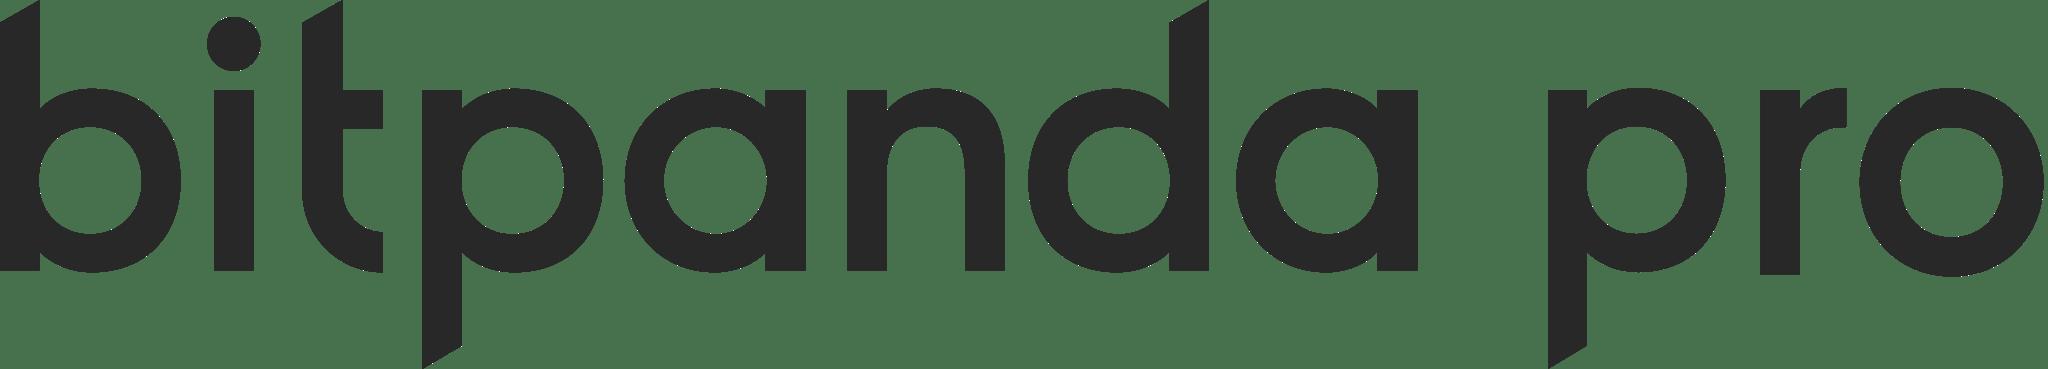 Bitpanda Pro Trading Wettbewerb